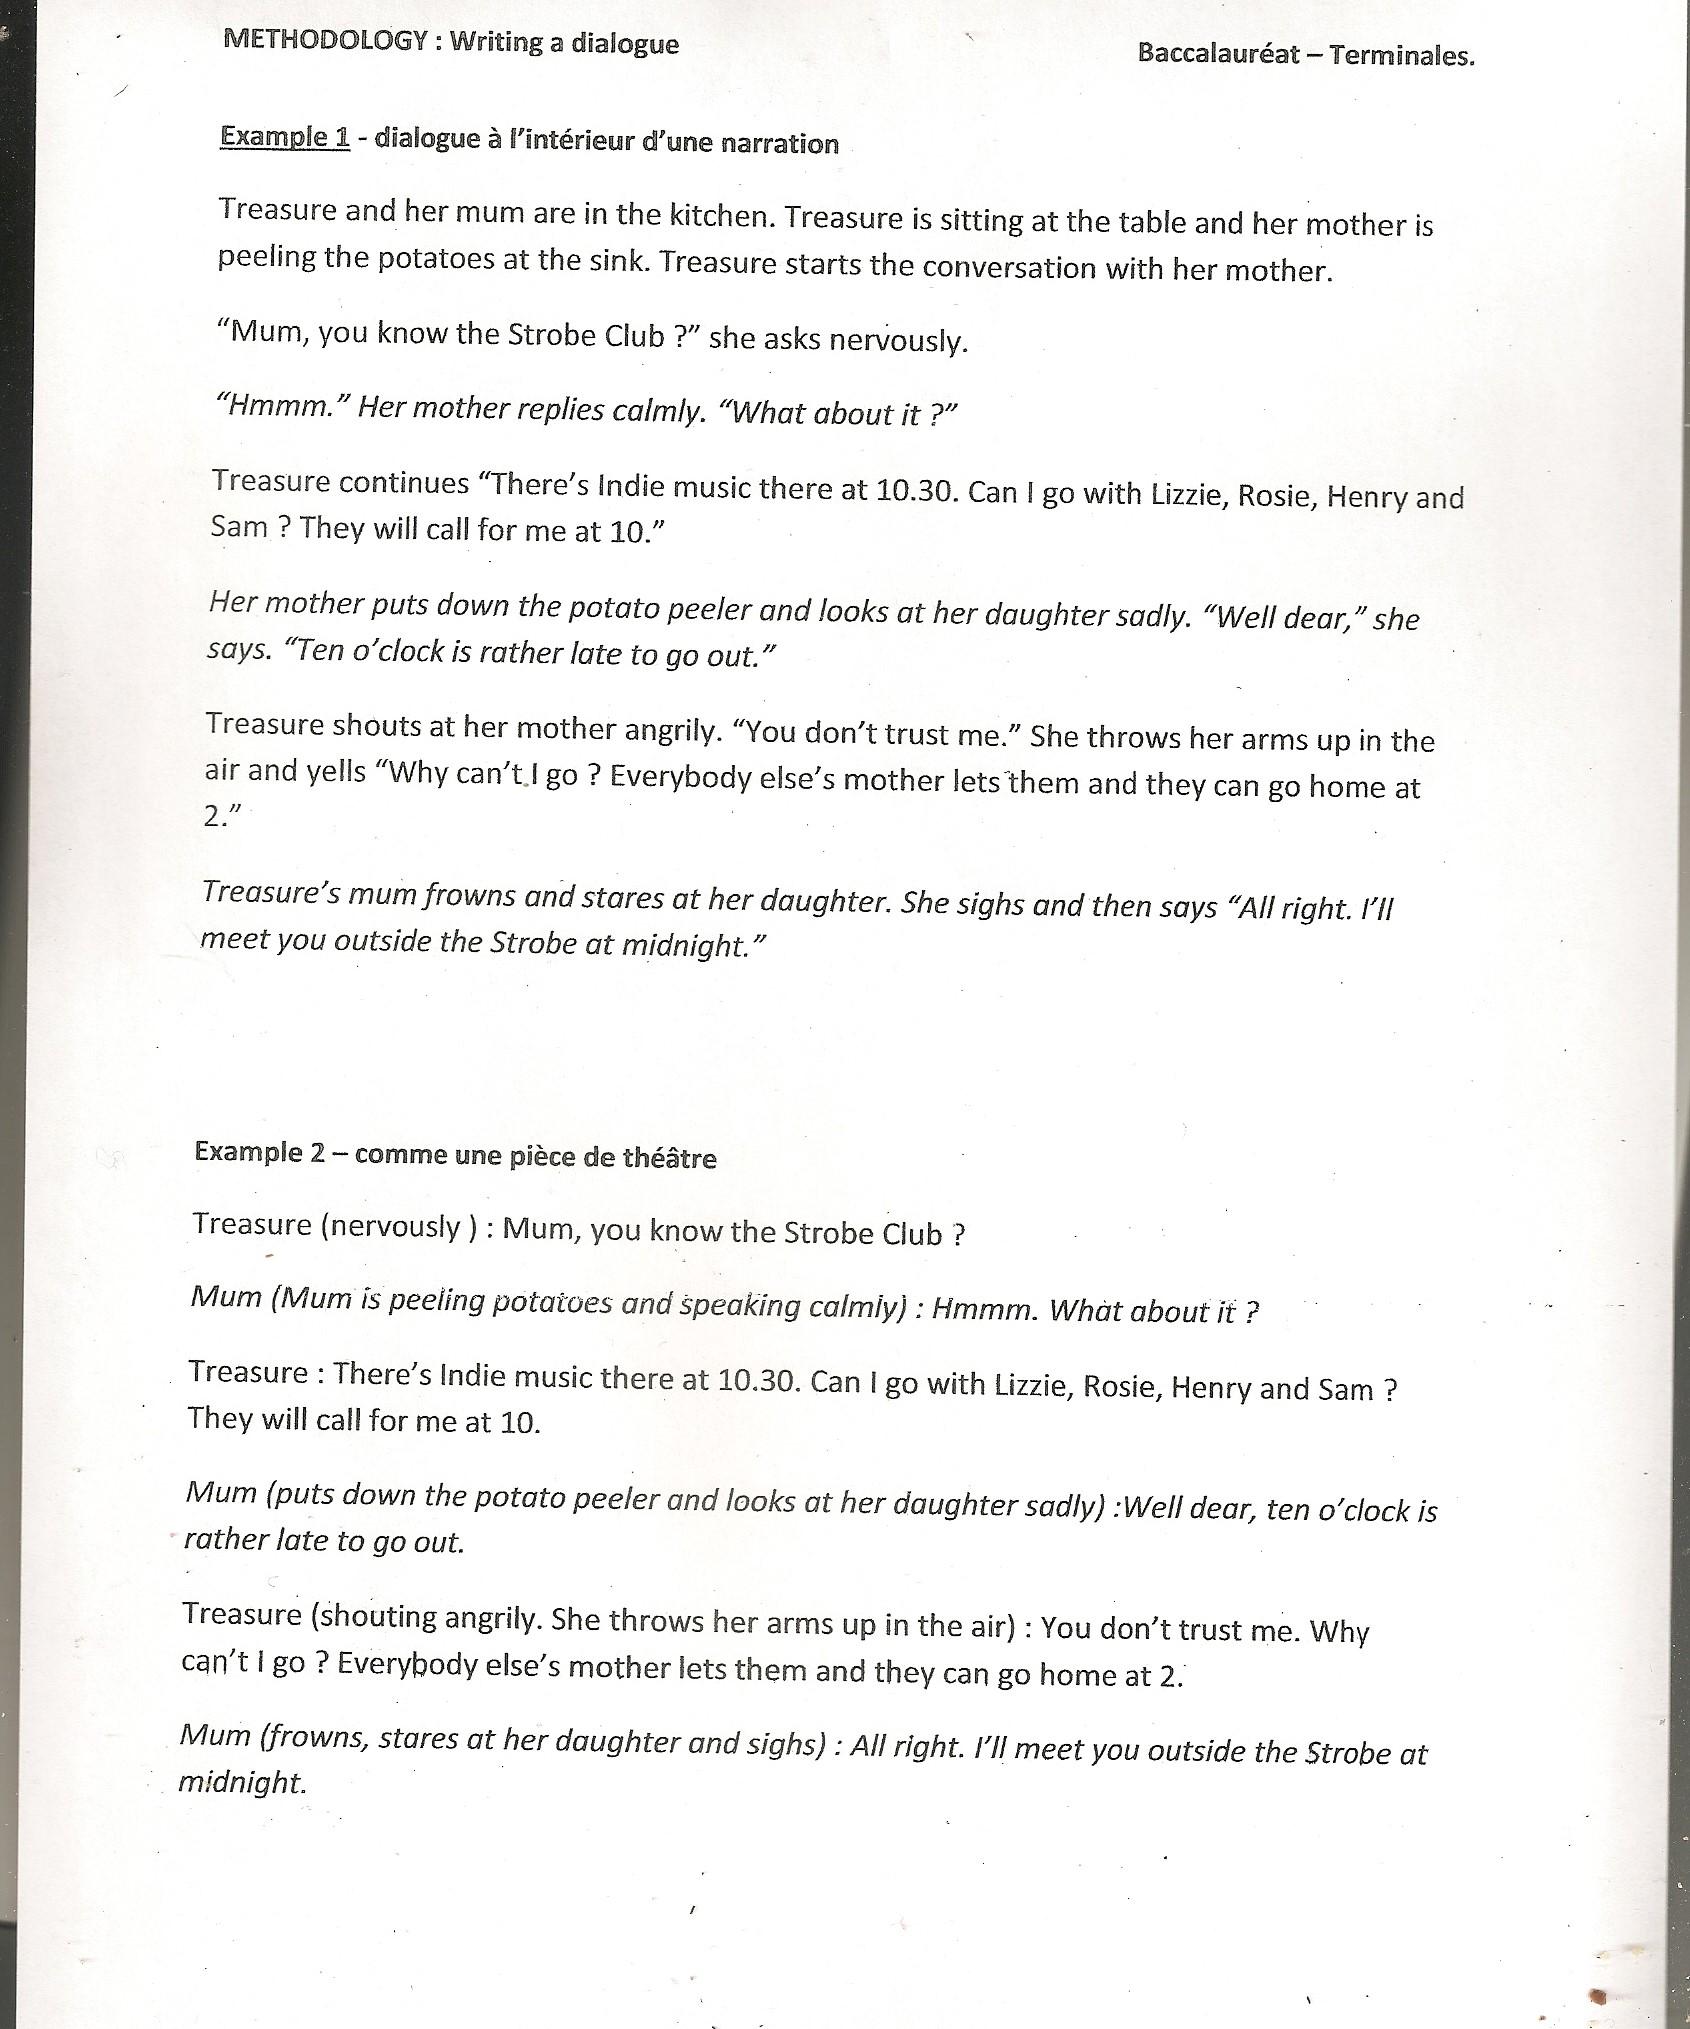 dissertation writing dallas tx Dissertation art therapydissertation writing services it dissertatioh dissertation art therapy academic writing want to writing services dc dallas tx.